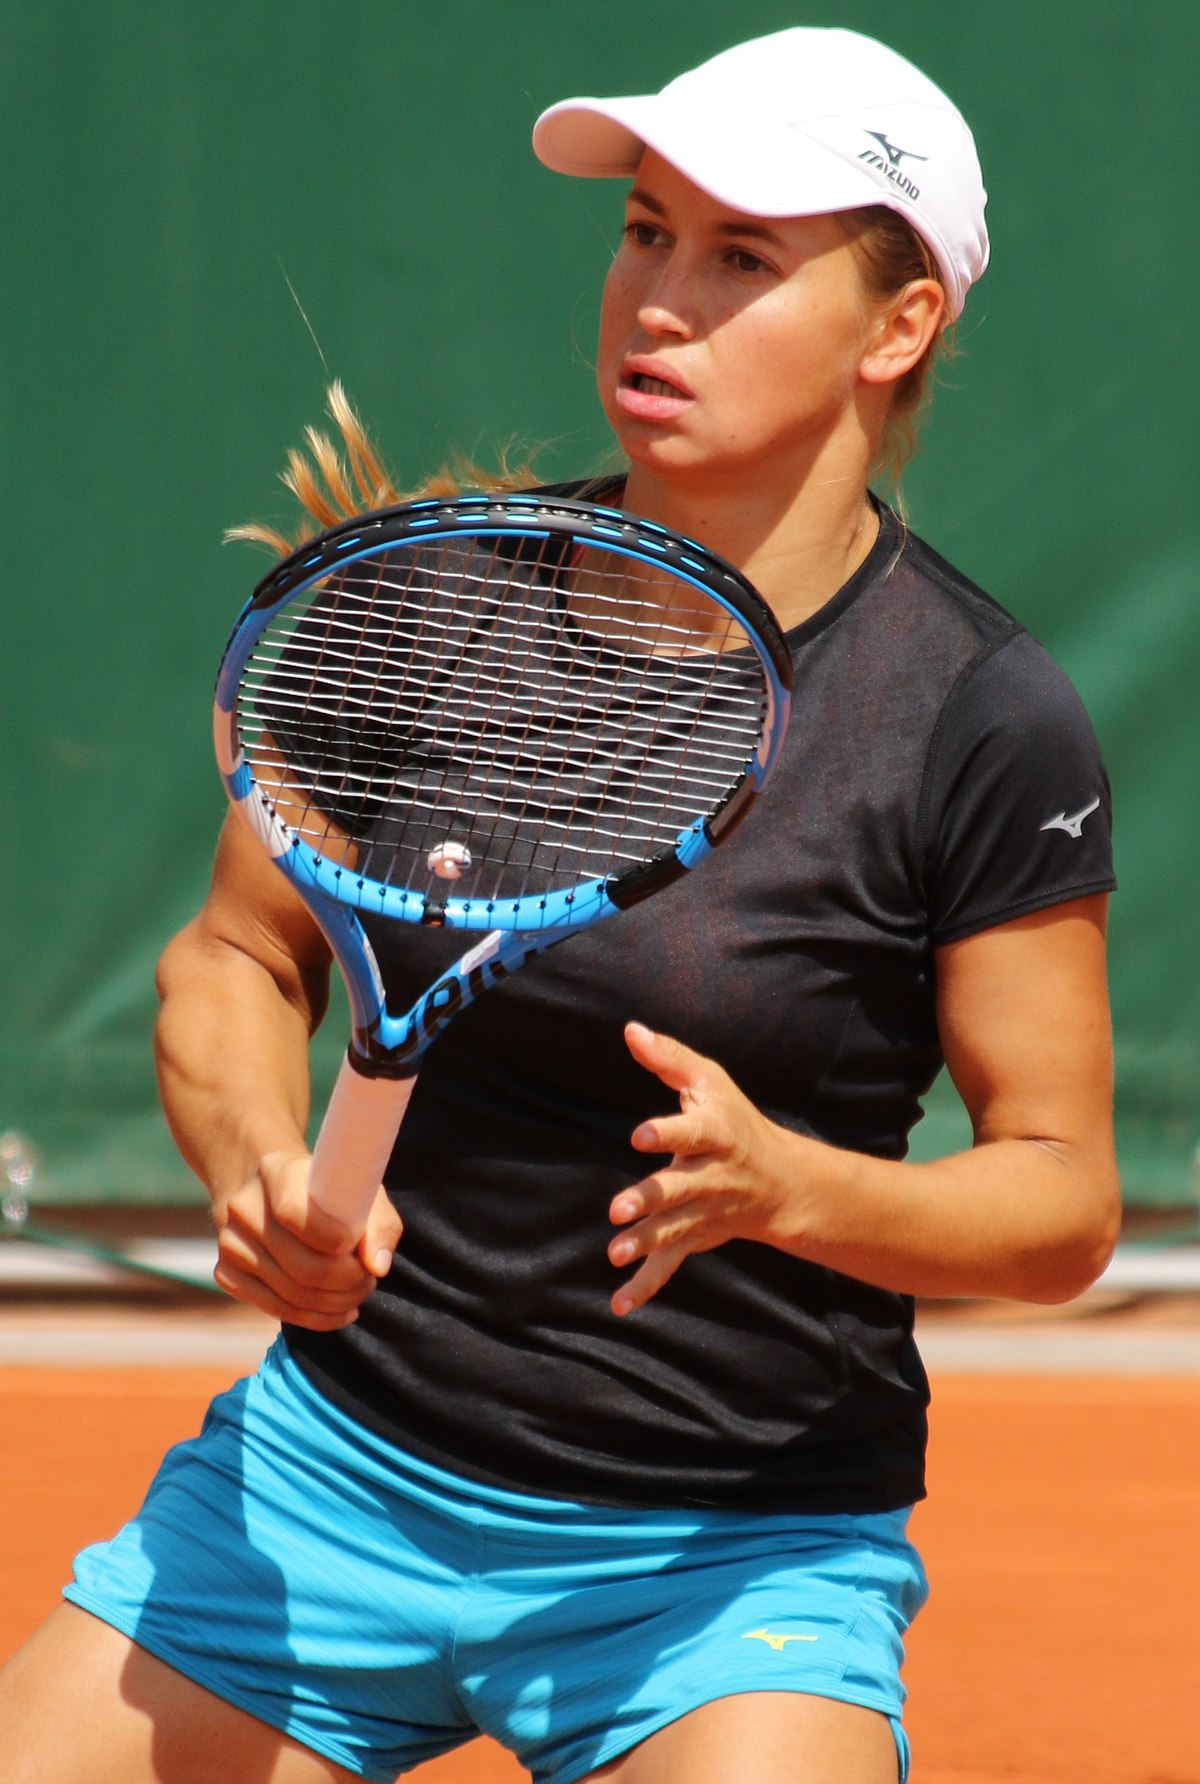 yulia putintseva - photo #14